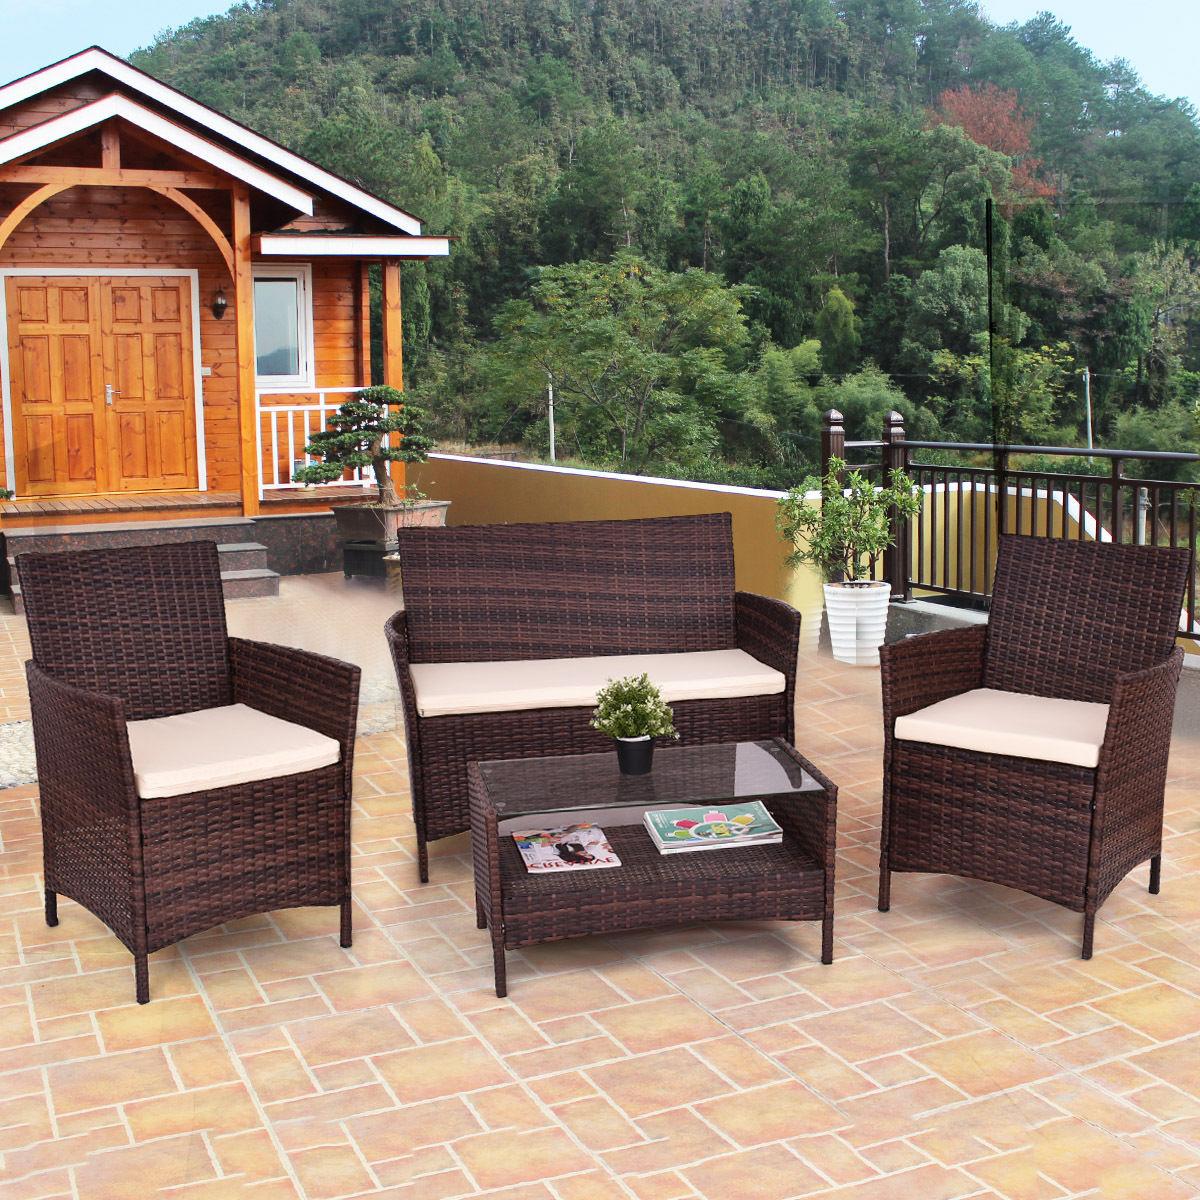 4PCS Outdoor Patio PE Rattan Wicker Table Shelf Sofa Furniture Set With Cushion HW63214